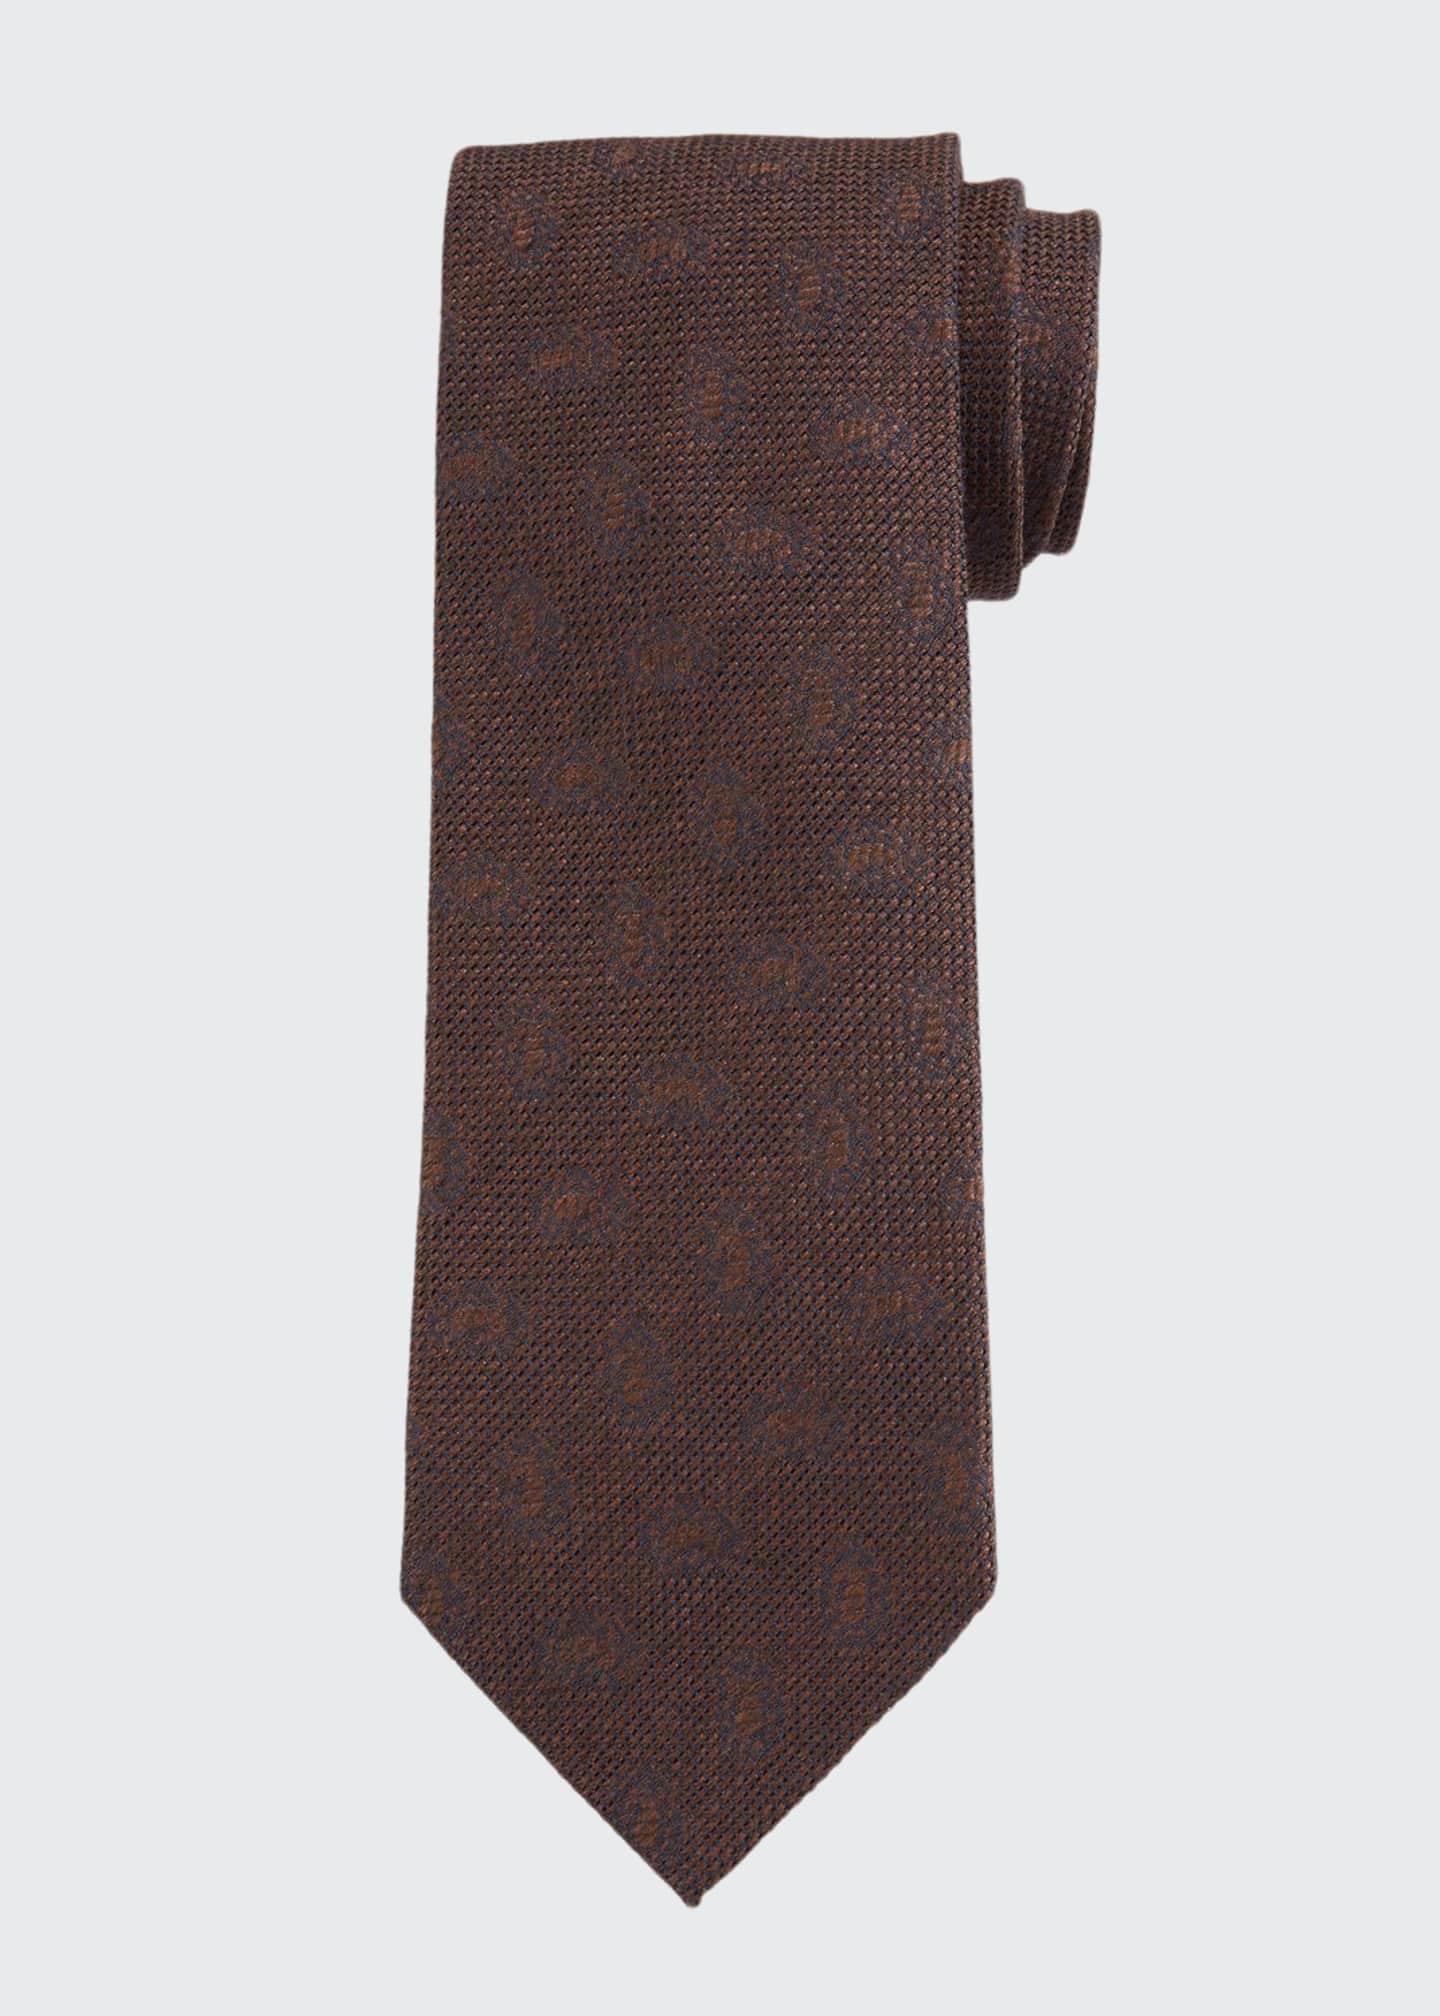 Bigi Men's Solid Jacquard Tie